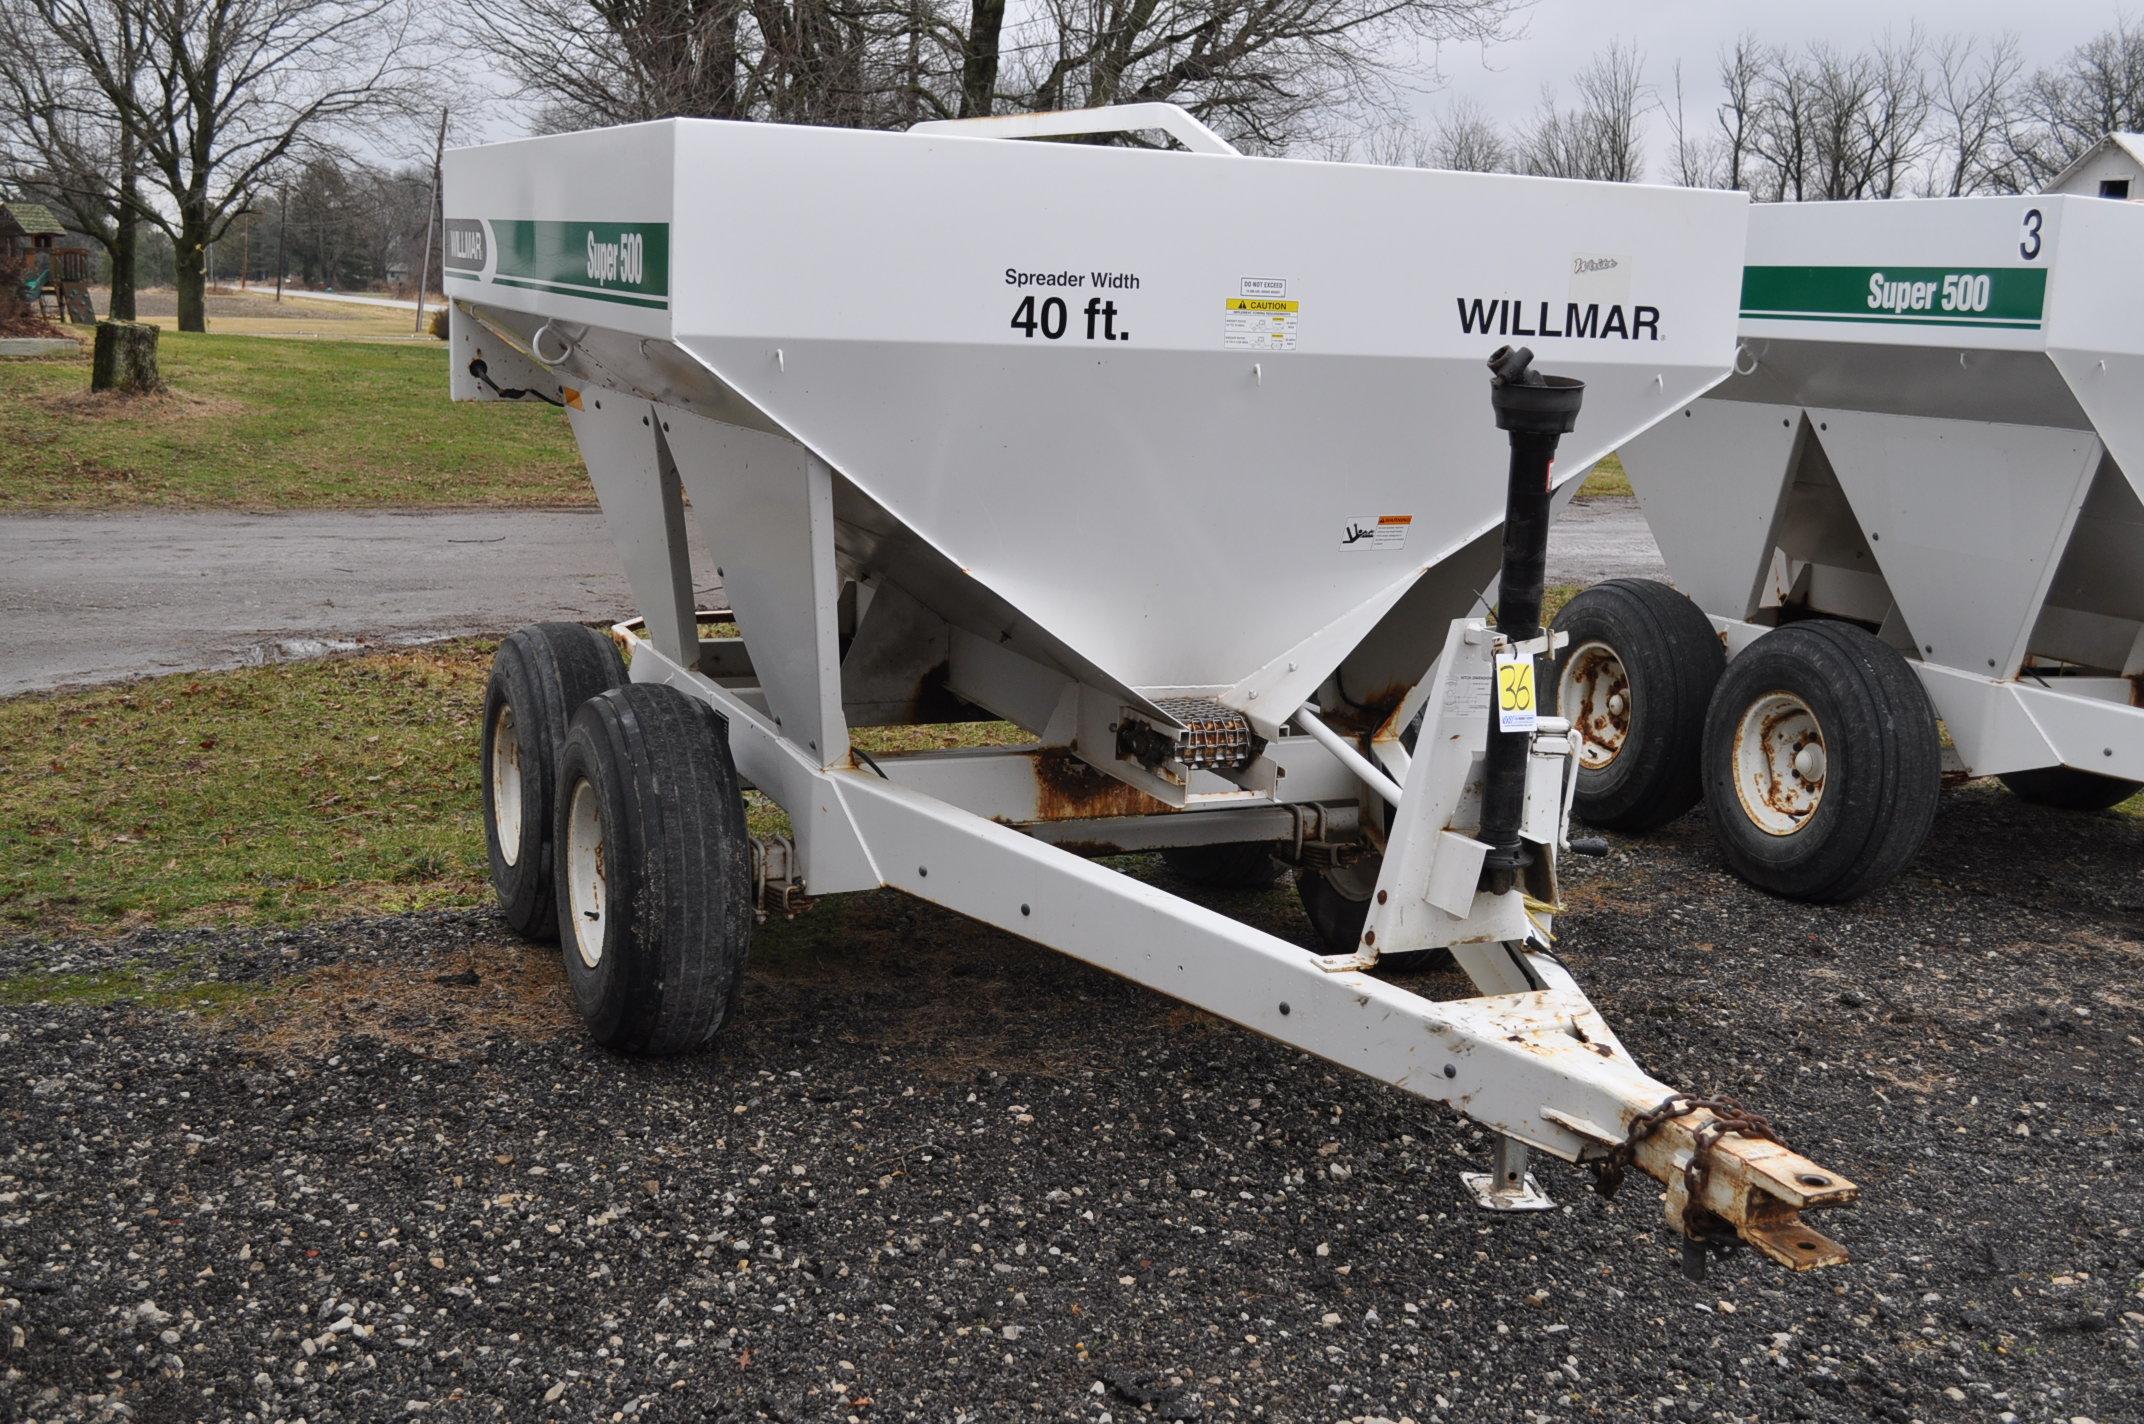 Wilmar Super 500 dry fertilizer spreaders, tandem axles, 12.5L-15 tires, twin spreaders, 540 pto - Image 4 of 12